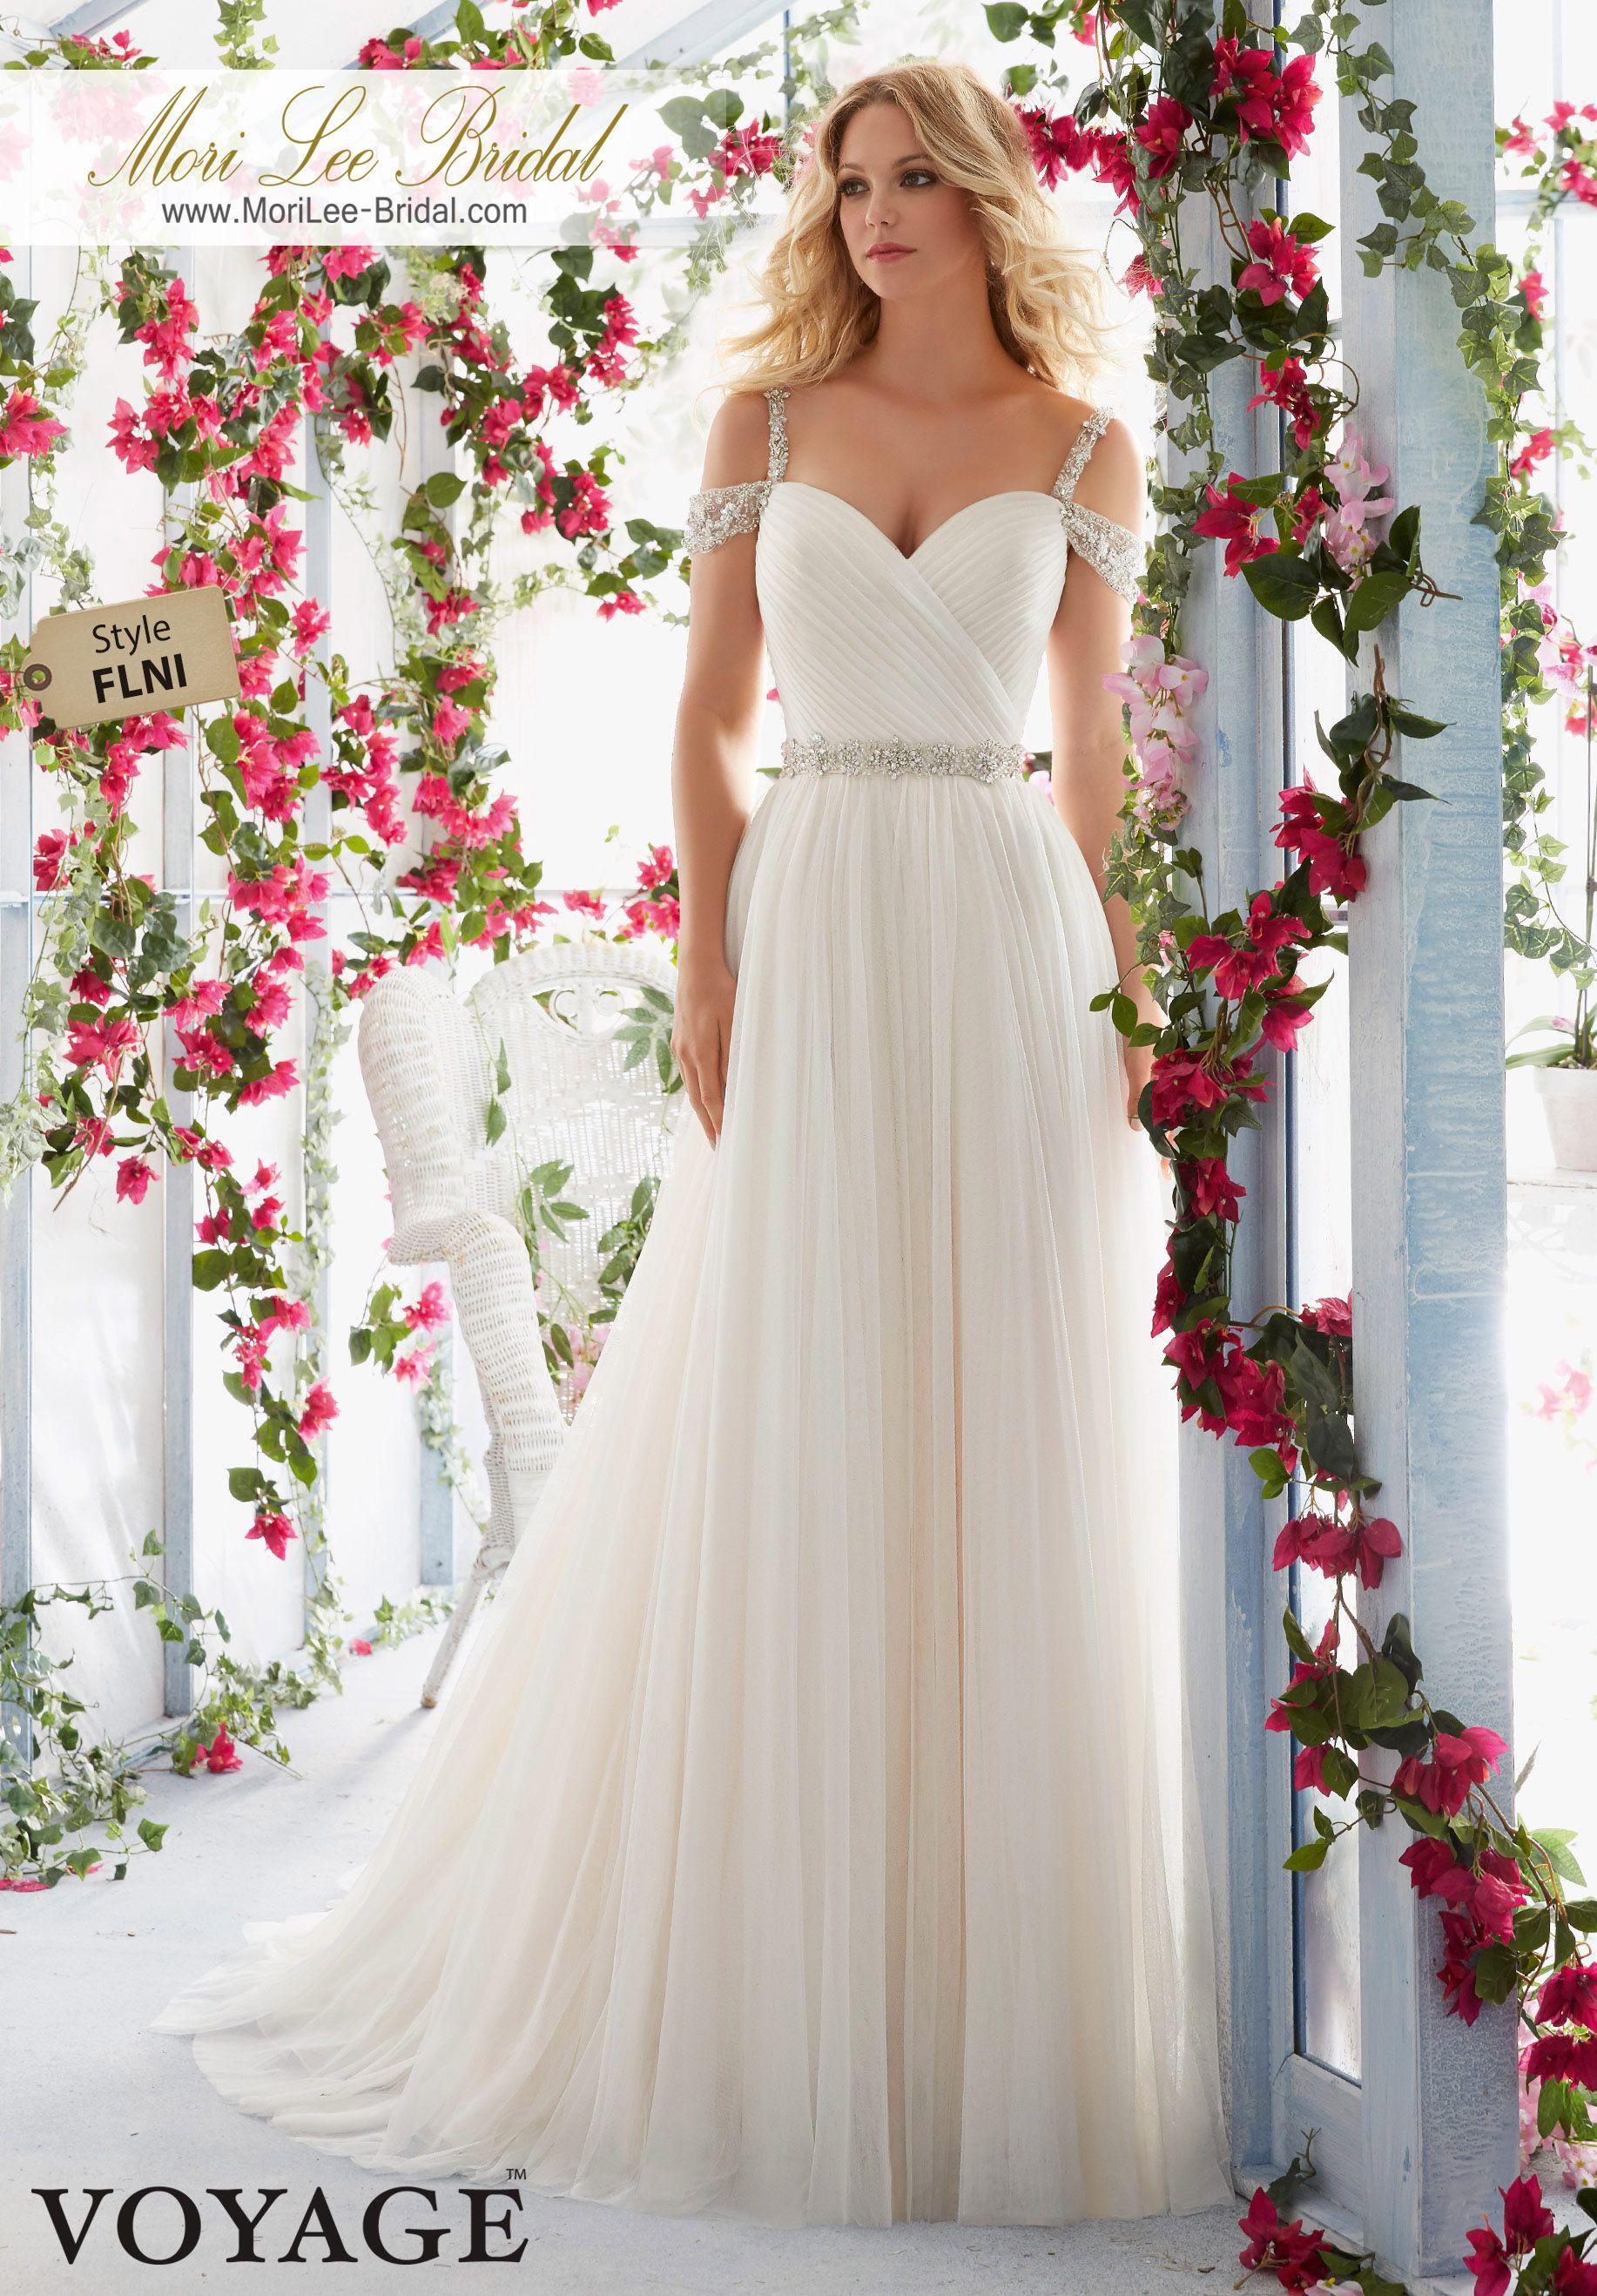 Bellas wedding dress  Dress Style FLNI Crystal Beaded Embroidered Straps On Cold Shoulder